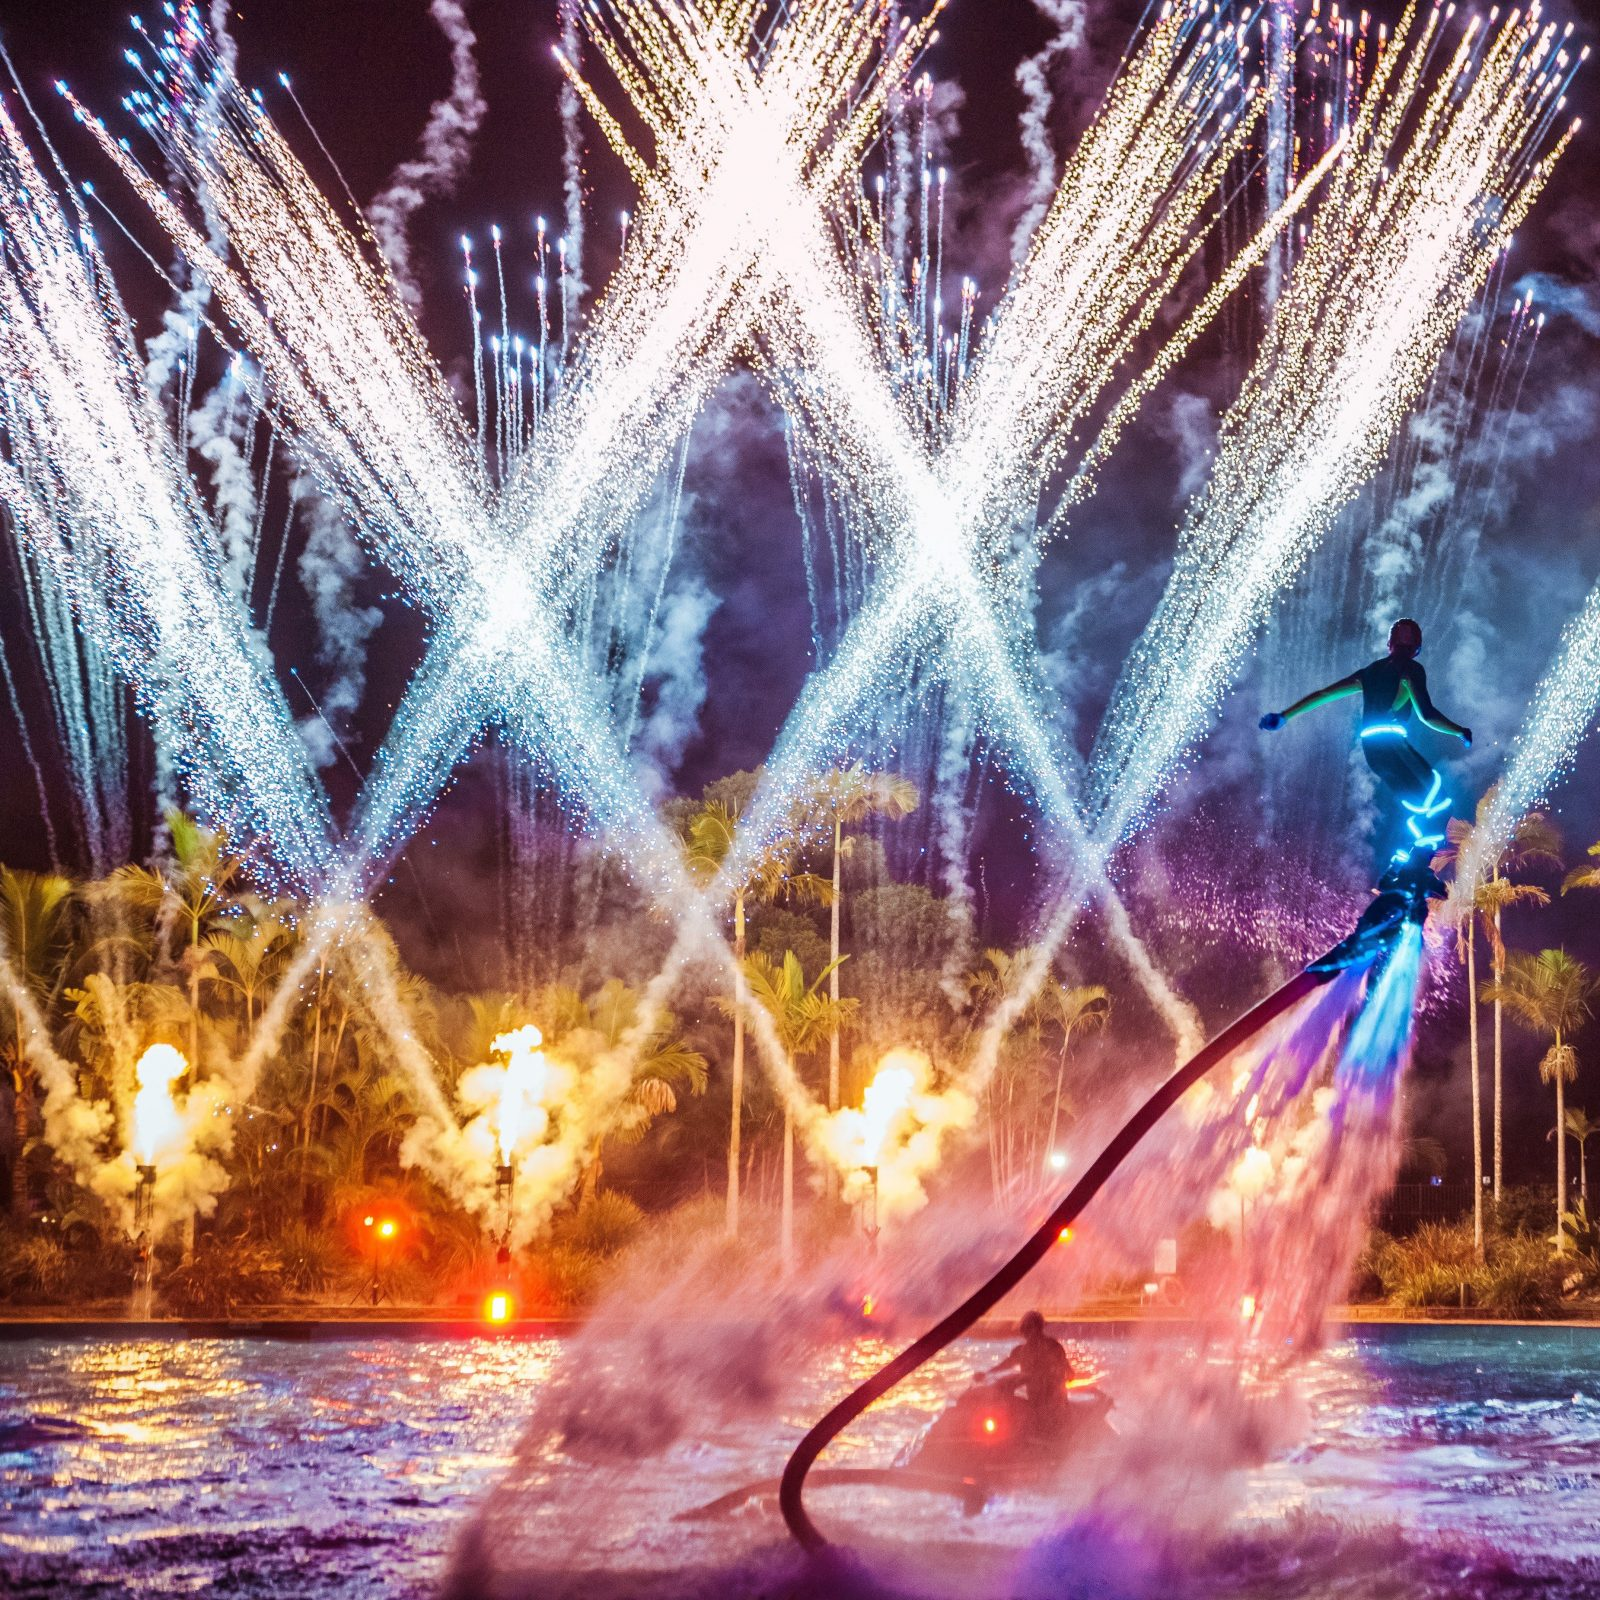 jetpack entertainment & events